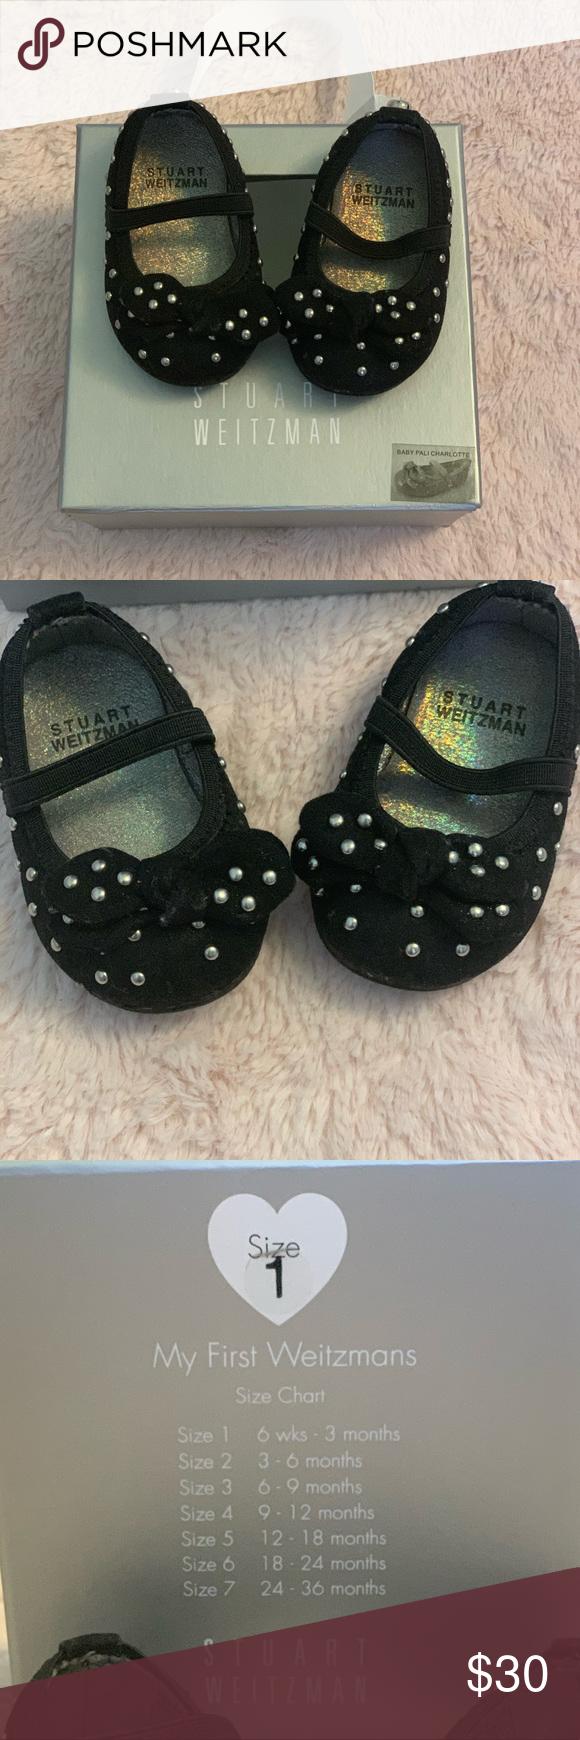 Stuart Weitzman baby shoes size 1